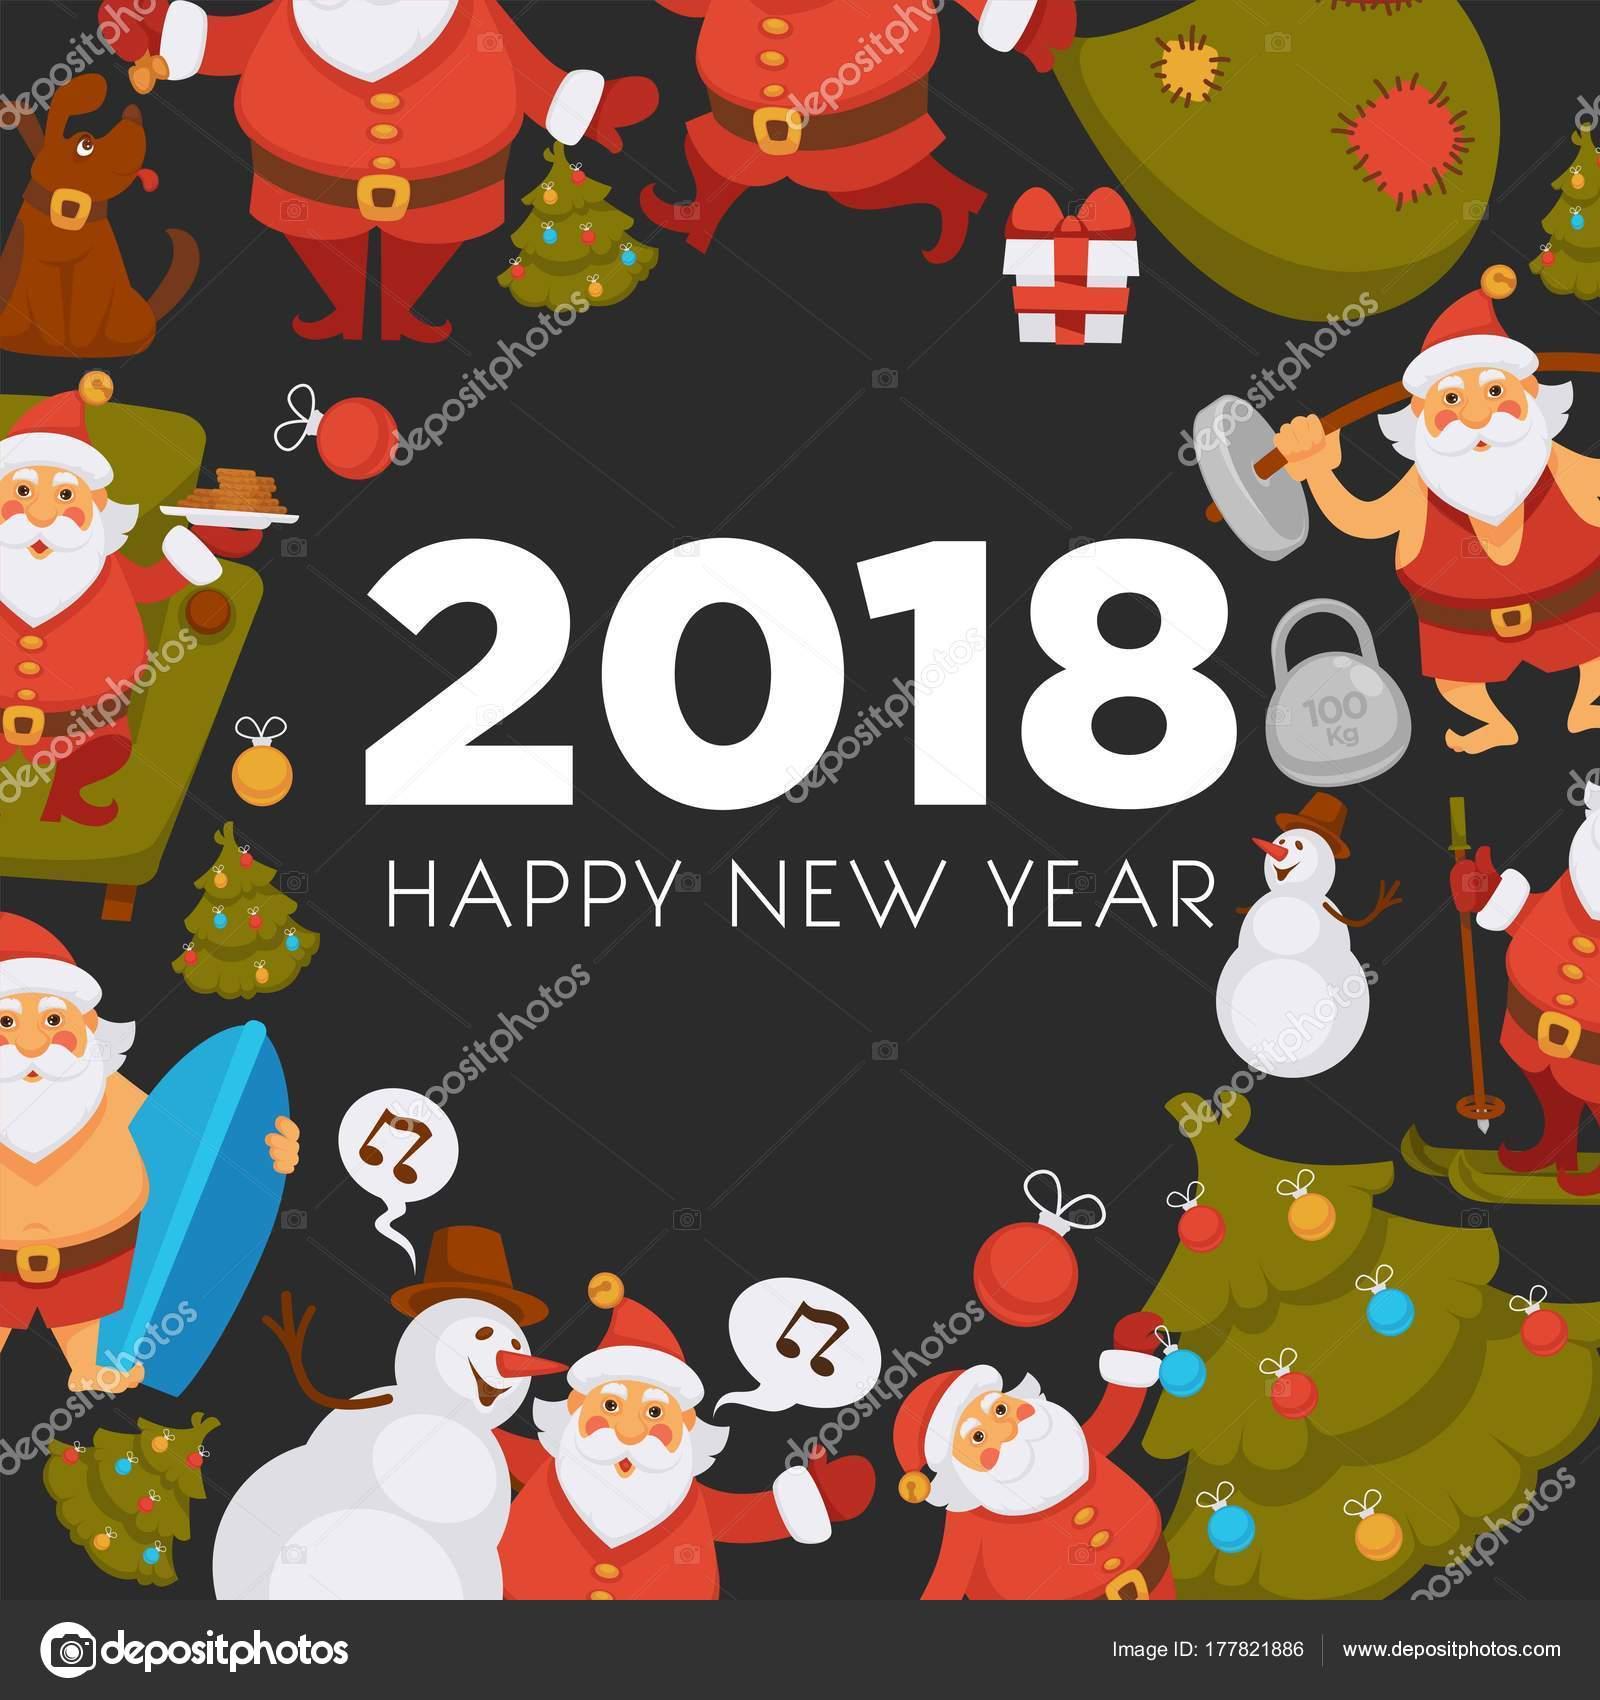 Happy New Year Cartoon Santa Celebrating Holidays Or Having Leisure Summer  Fun Icons For Greeting Card Design. Vector Funny Santa Character Decorating  Xmas, ...